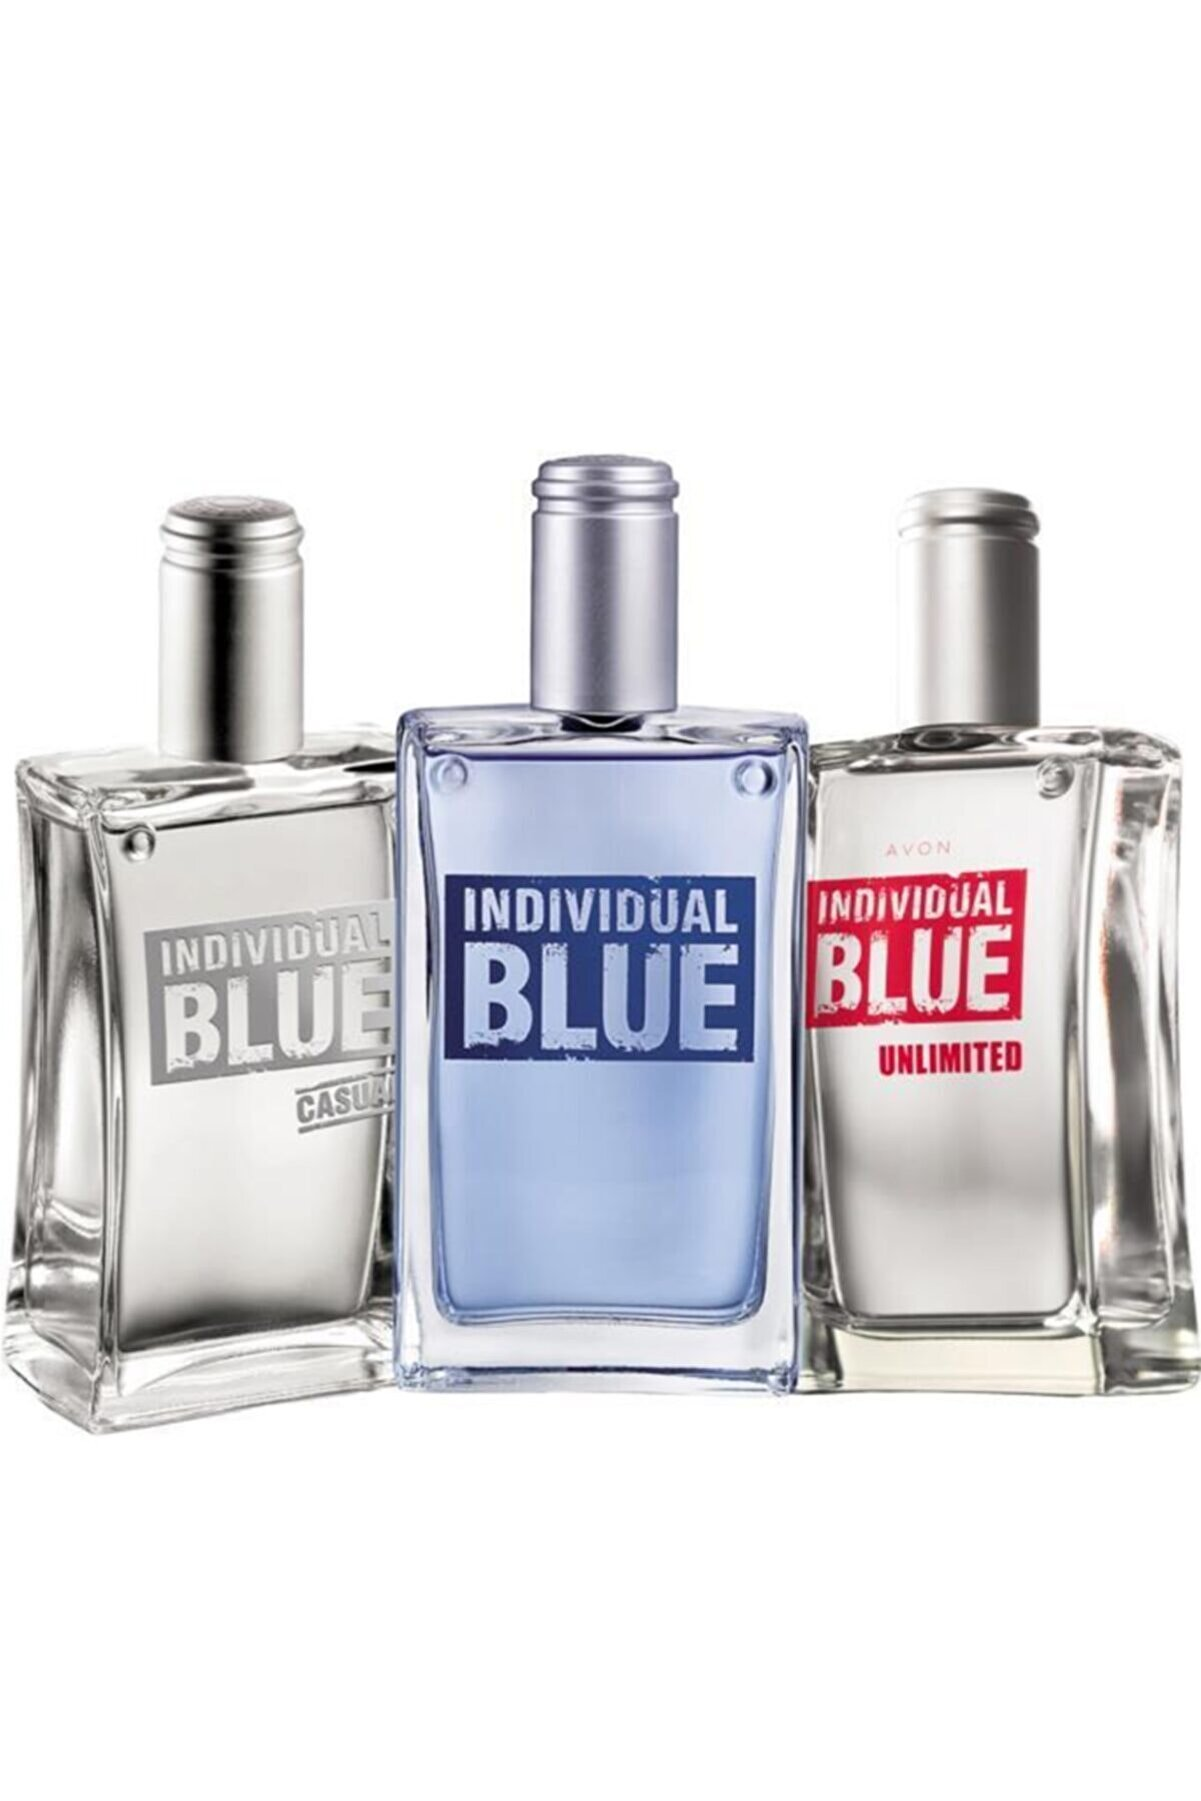 Avon Individual Blue Edt 100 ml Erkek+Individual Blue Unlimited Edt100 ml Erkek Parfüm Set  5050000000550